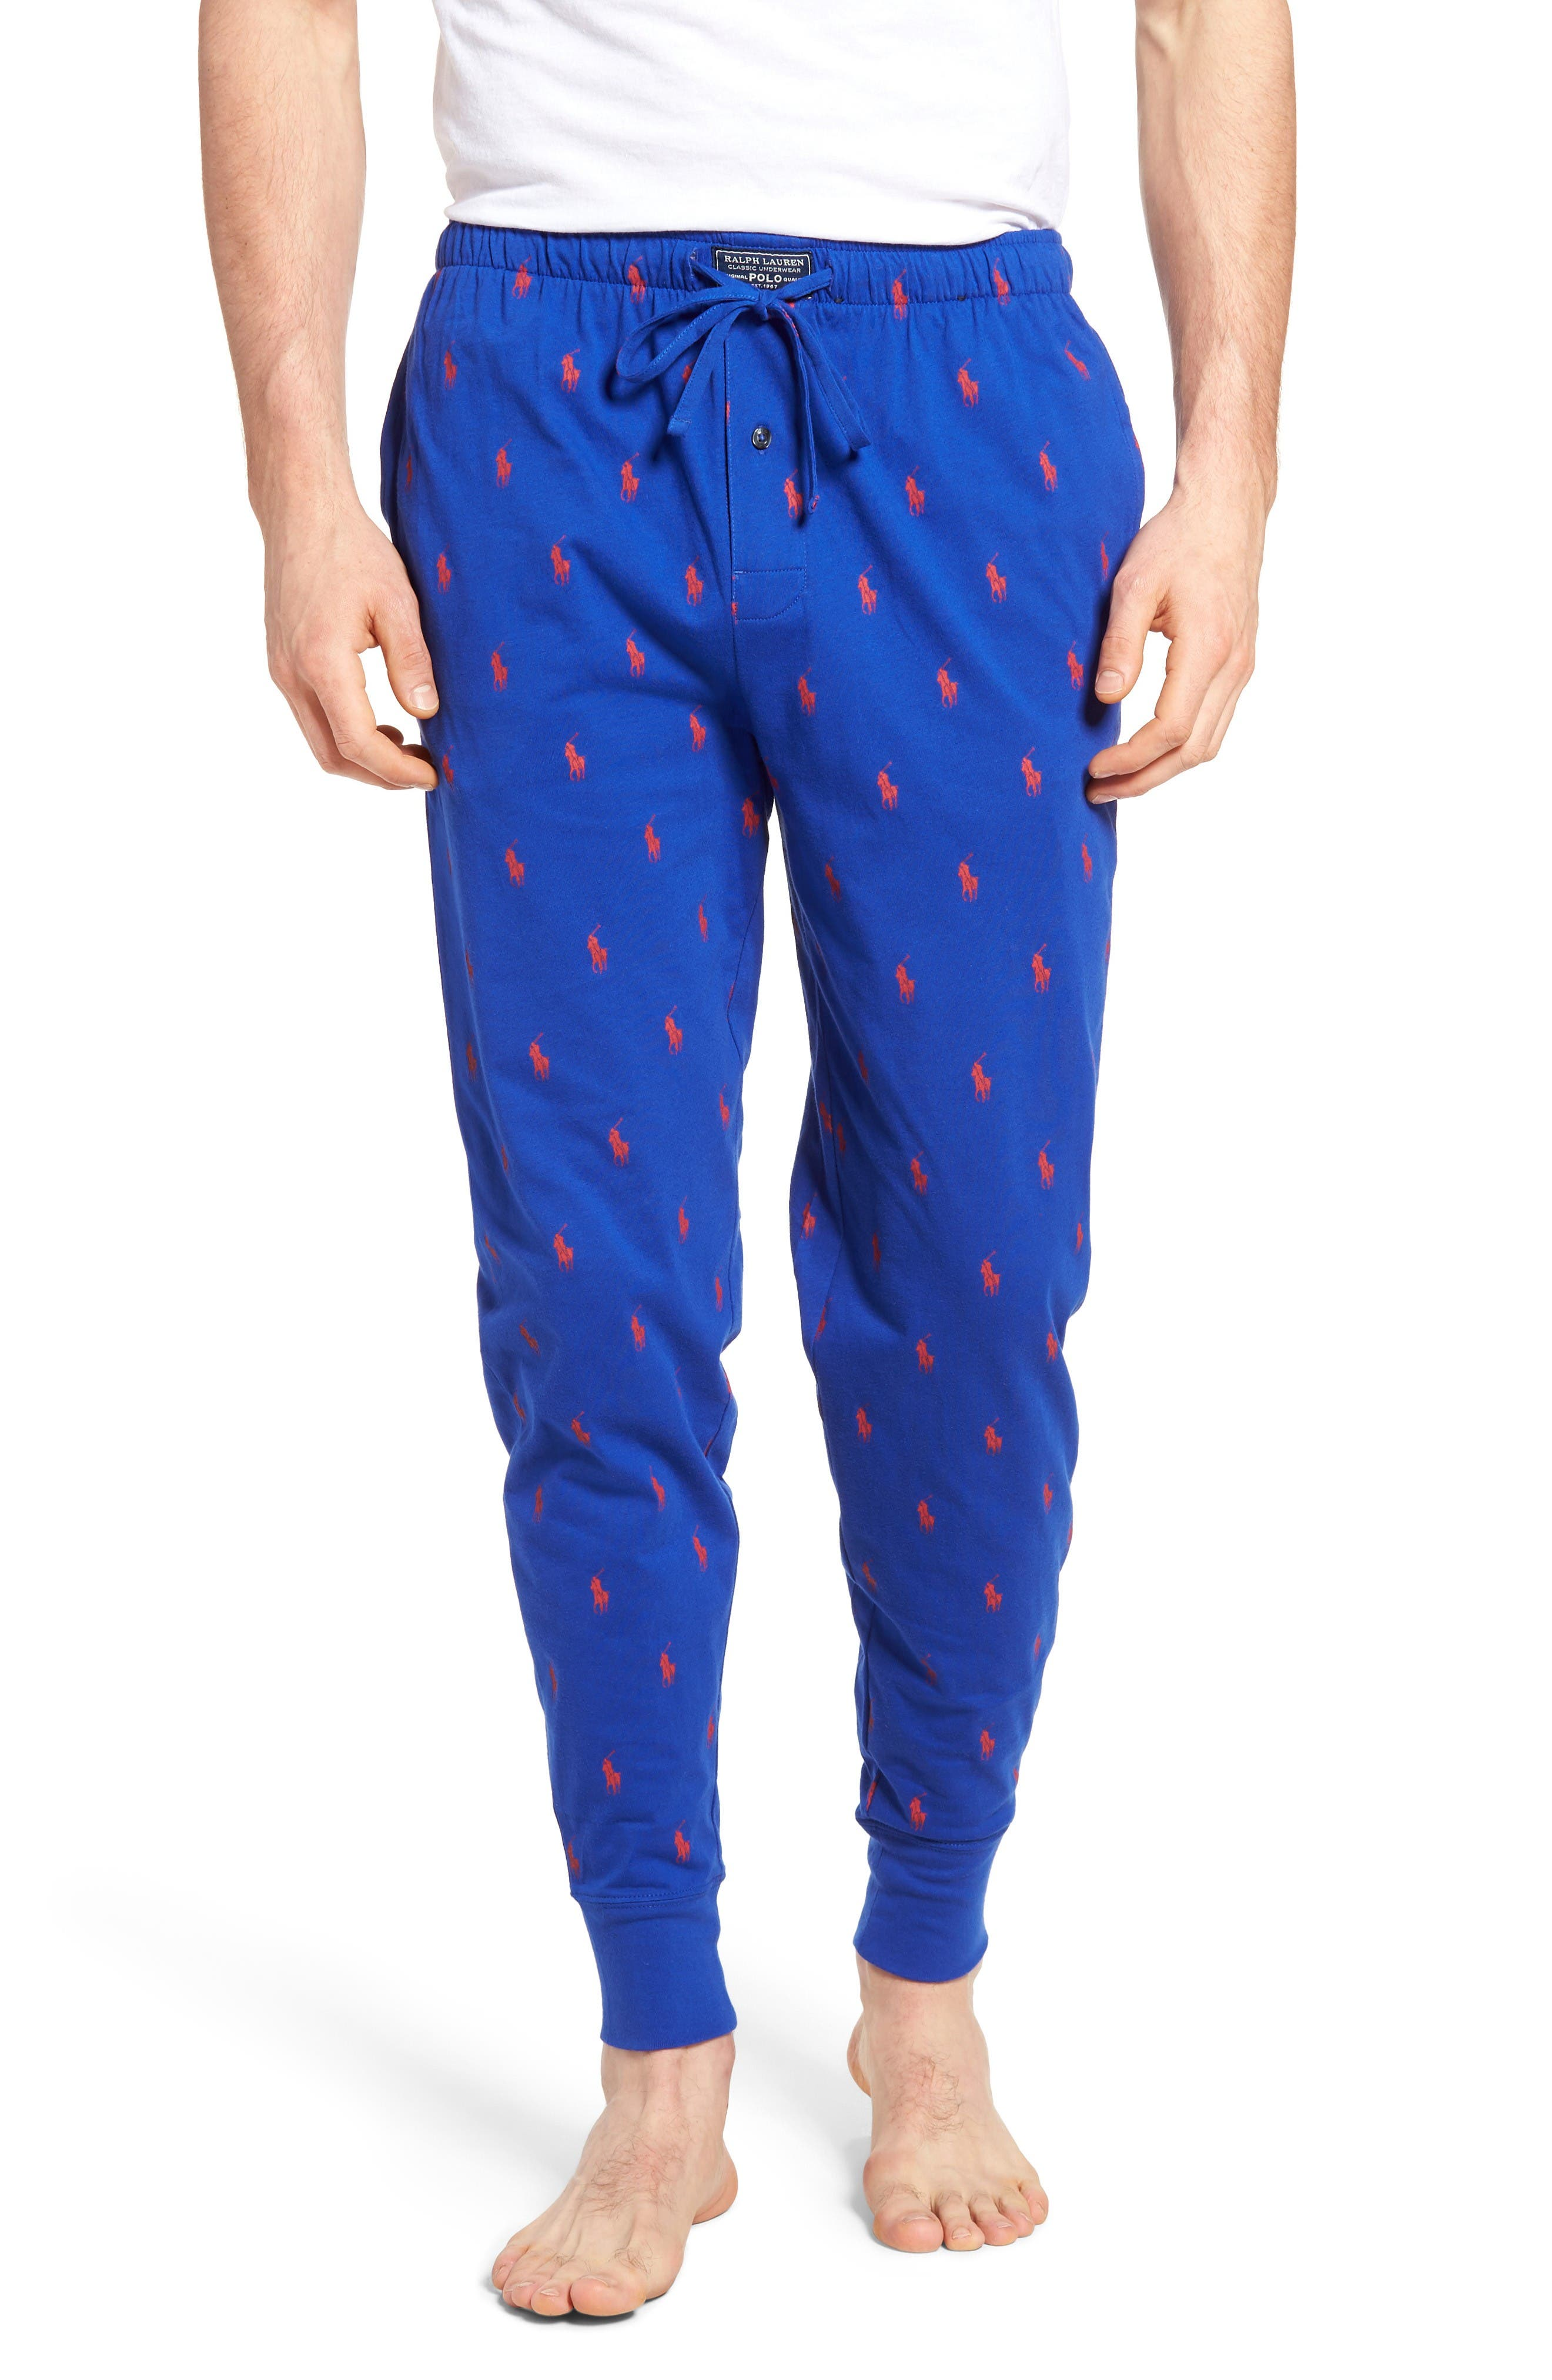 Polo Ralph Lauren Knit Pony Lounge Pants